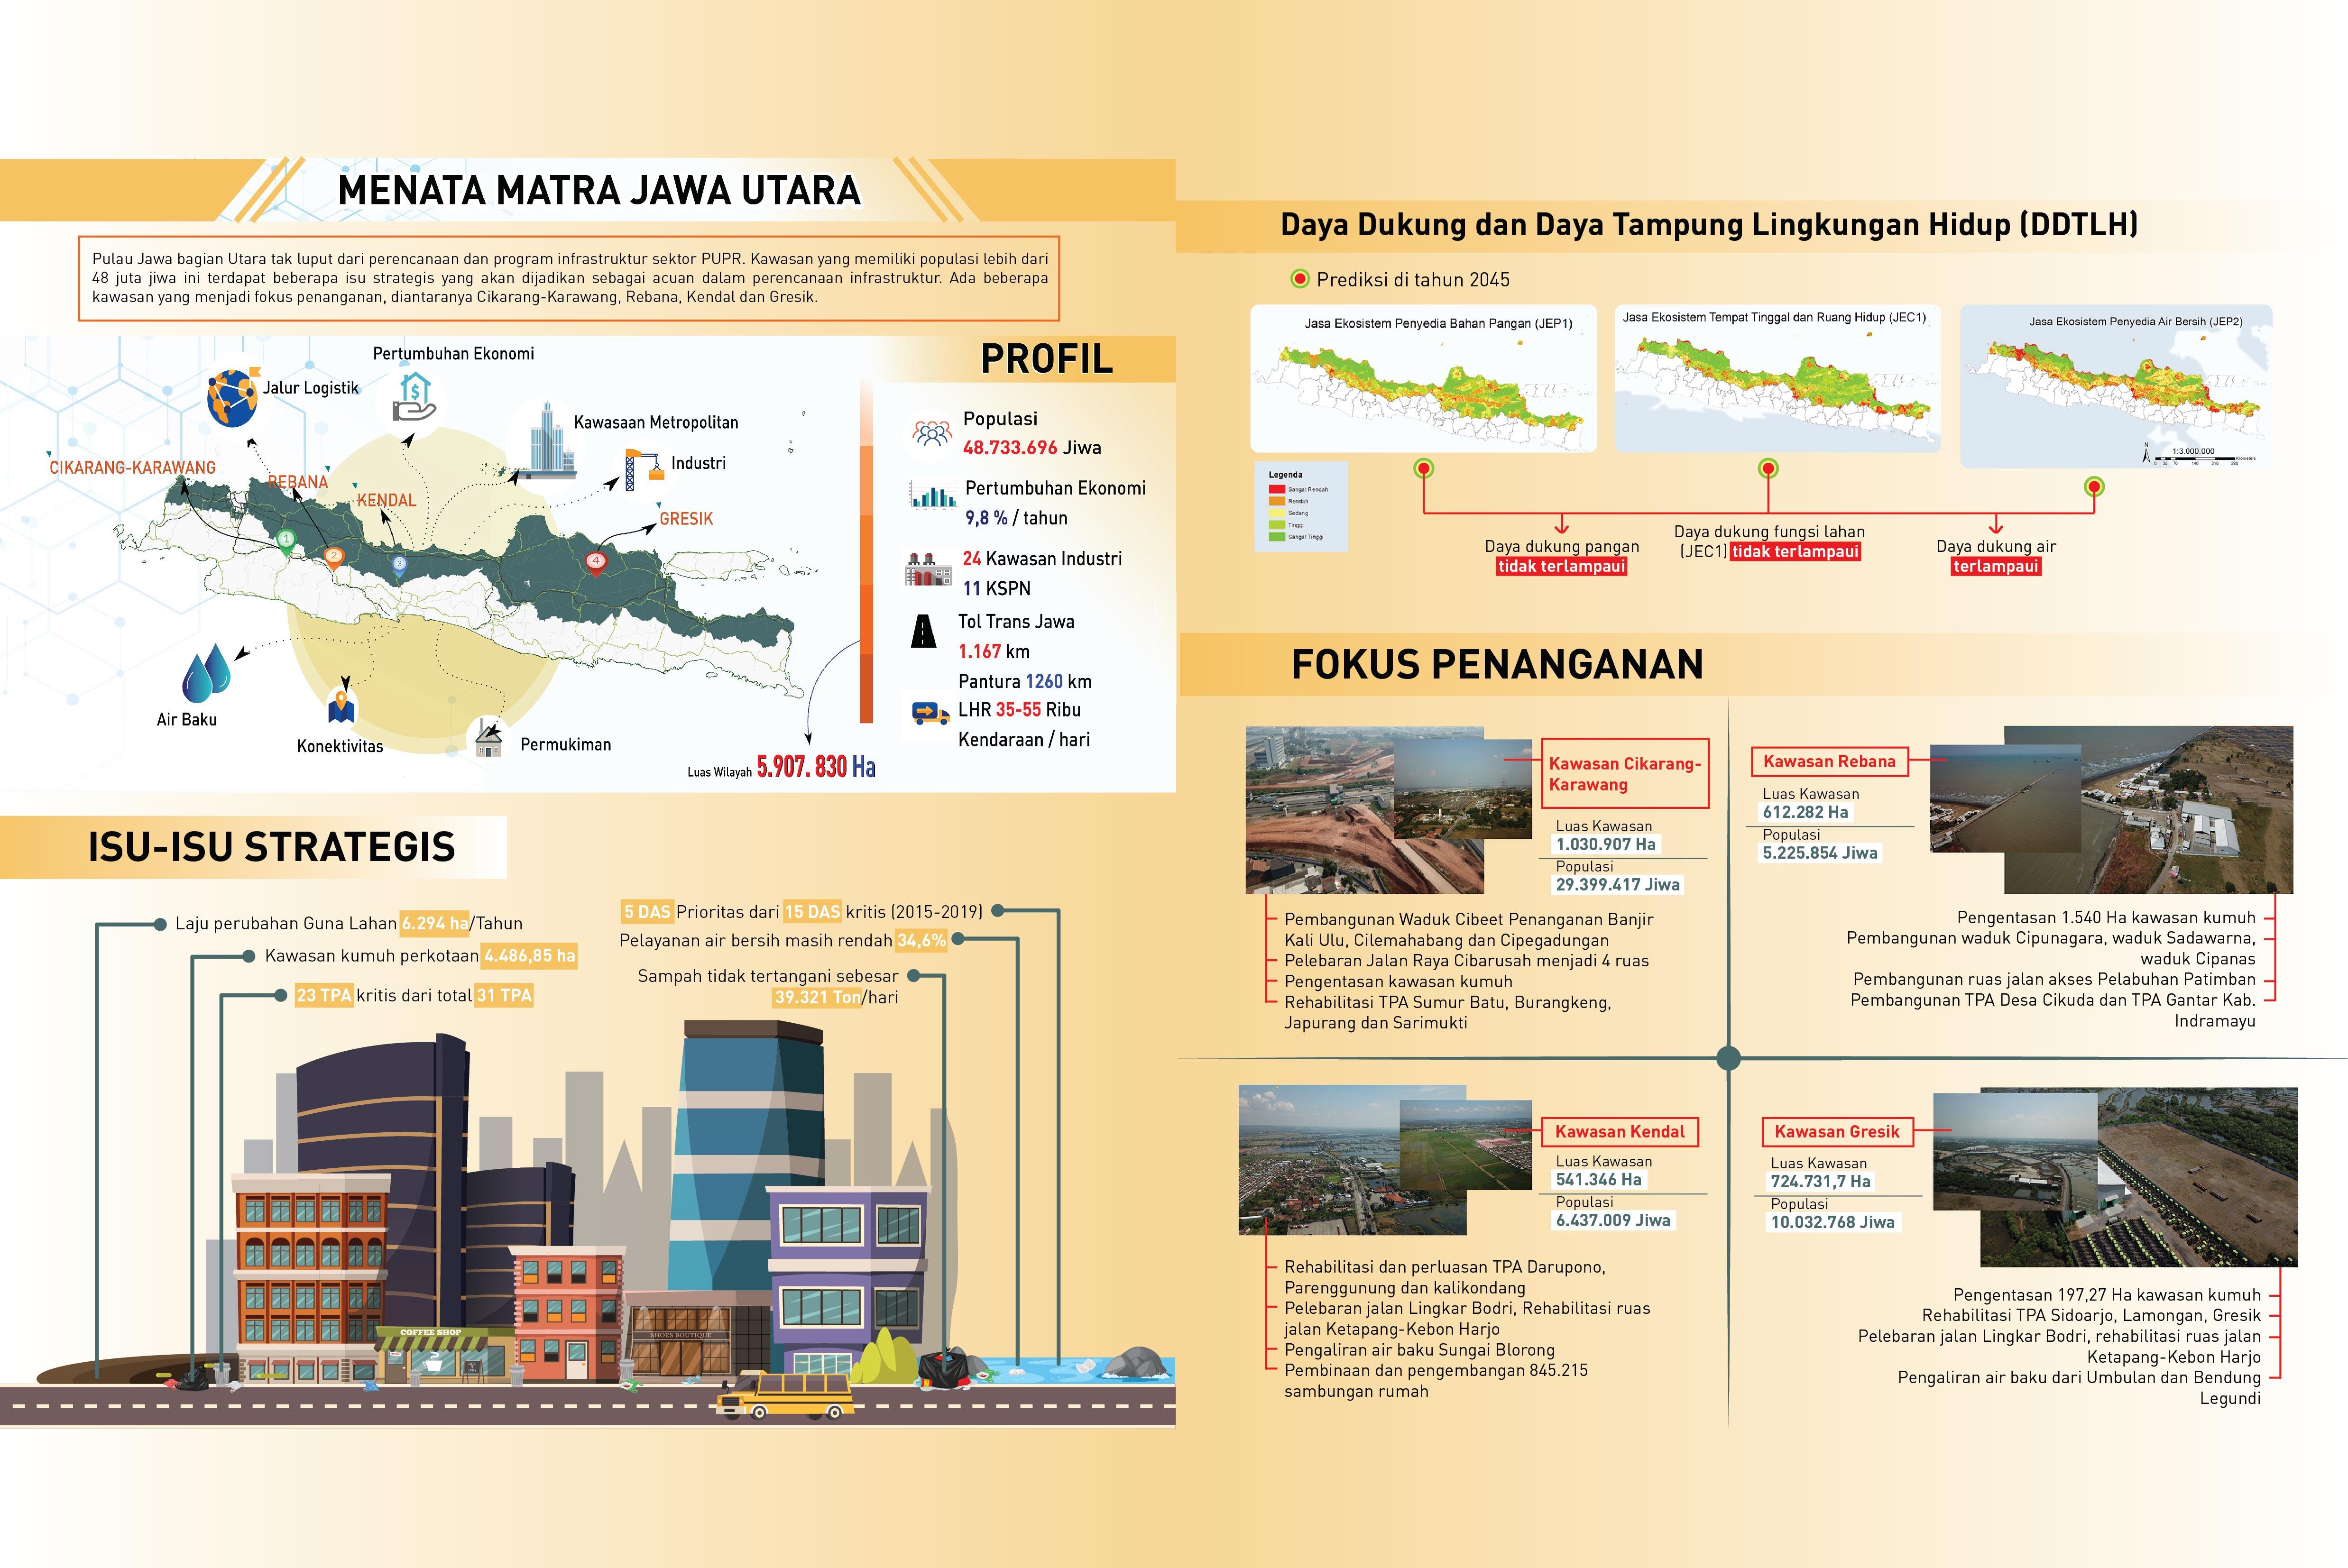 Menata Matra Jawa Utara